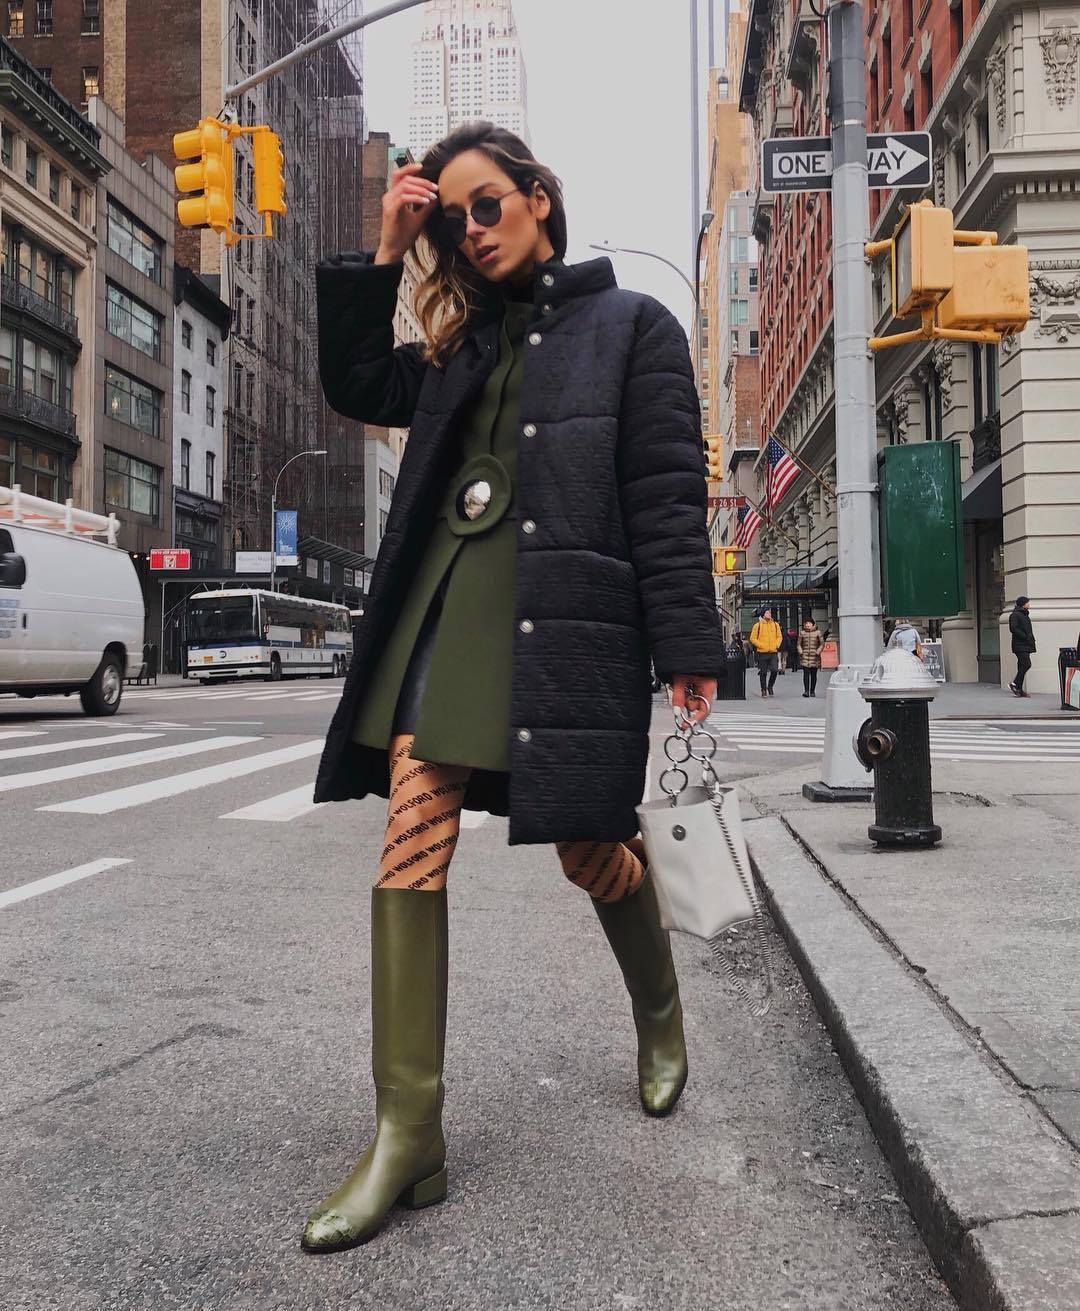 shoes knee high boots green boots tights white bag handbag black jacket puffer jacket green coat mini skirt black skirt leather skirt